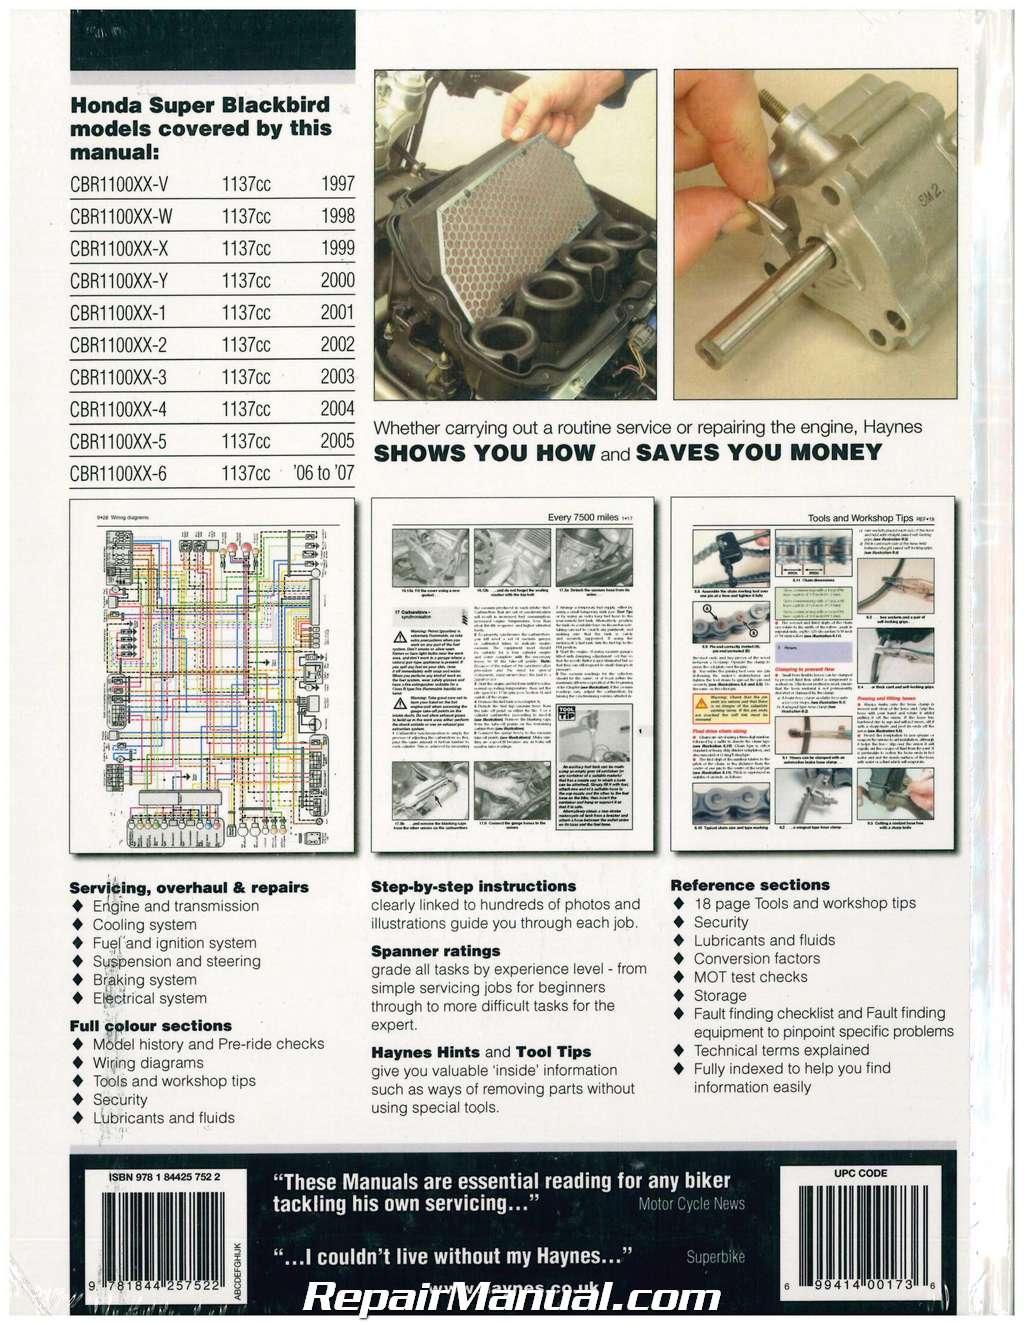 Diagram Of Honda Atv Parts 2000 Trx300fw Ac Wire Harness Diagram